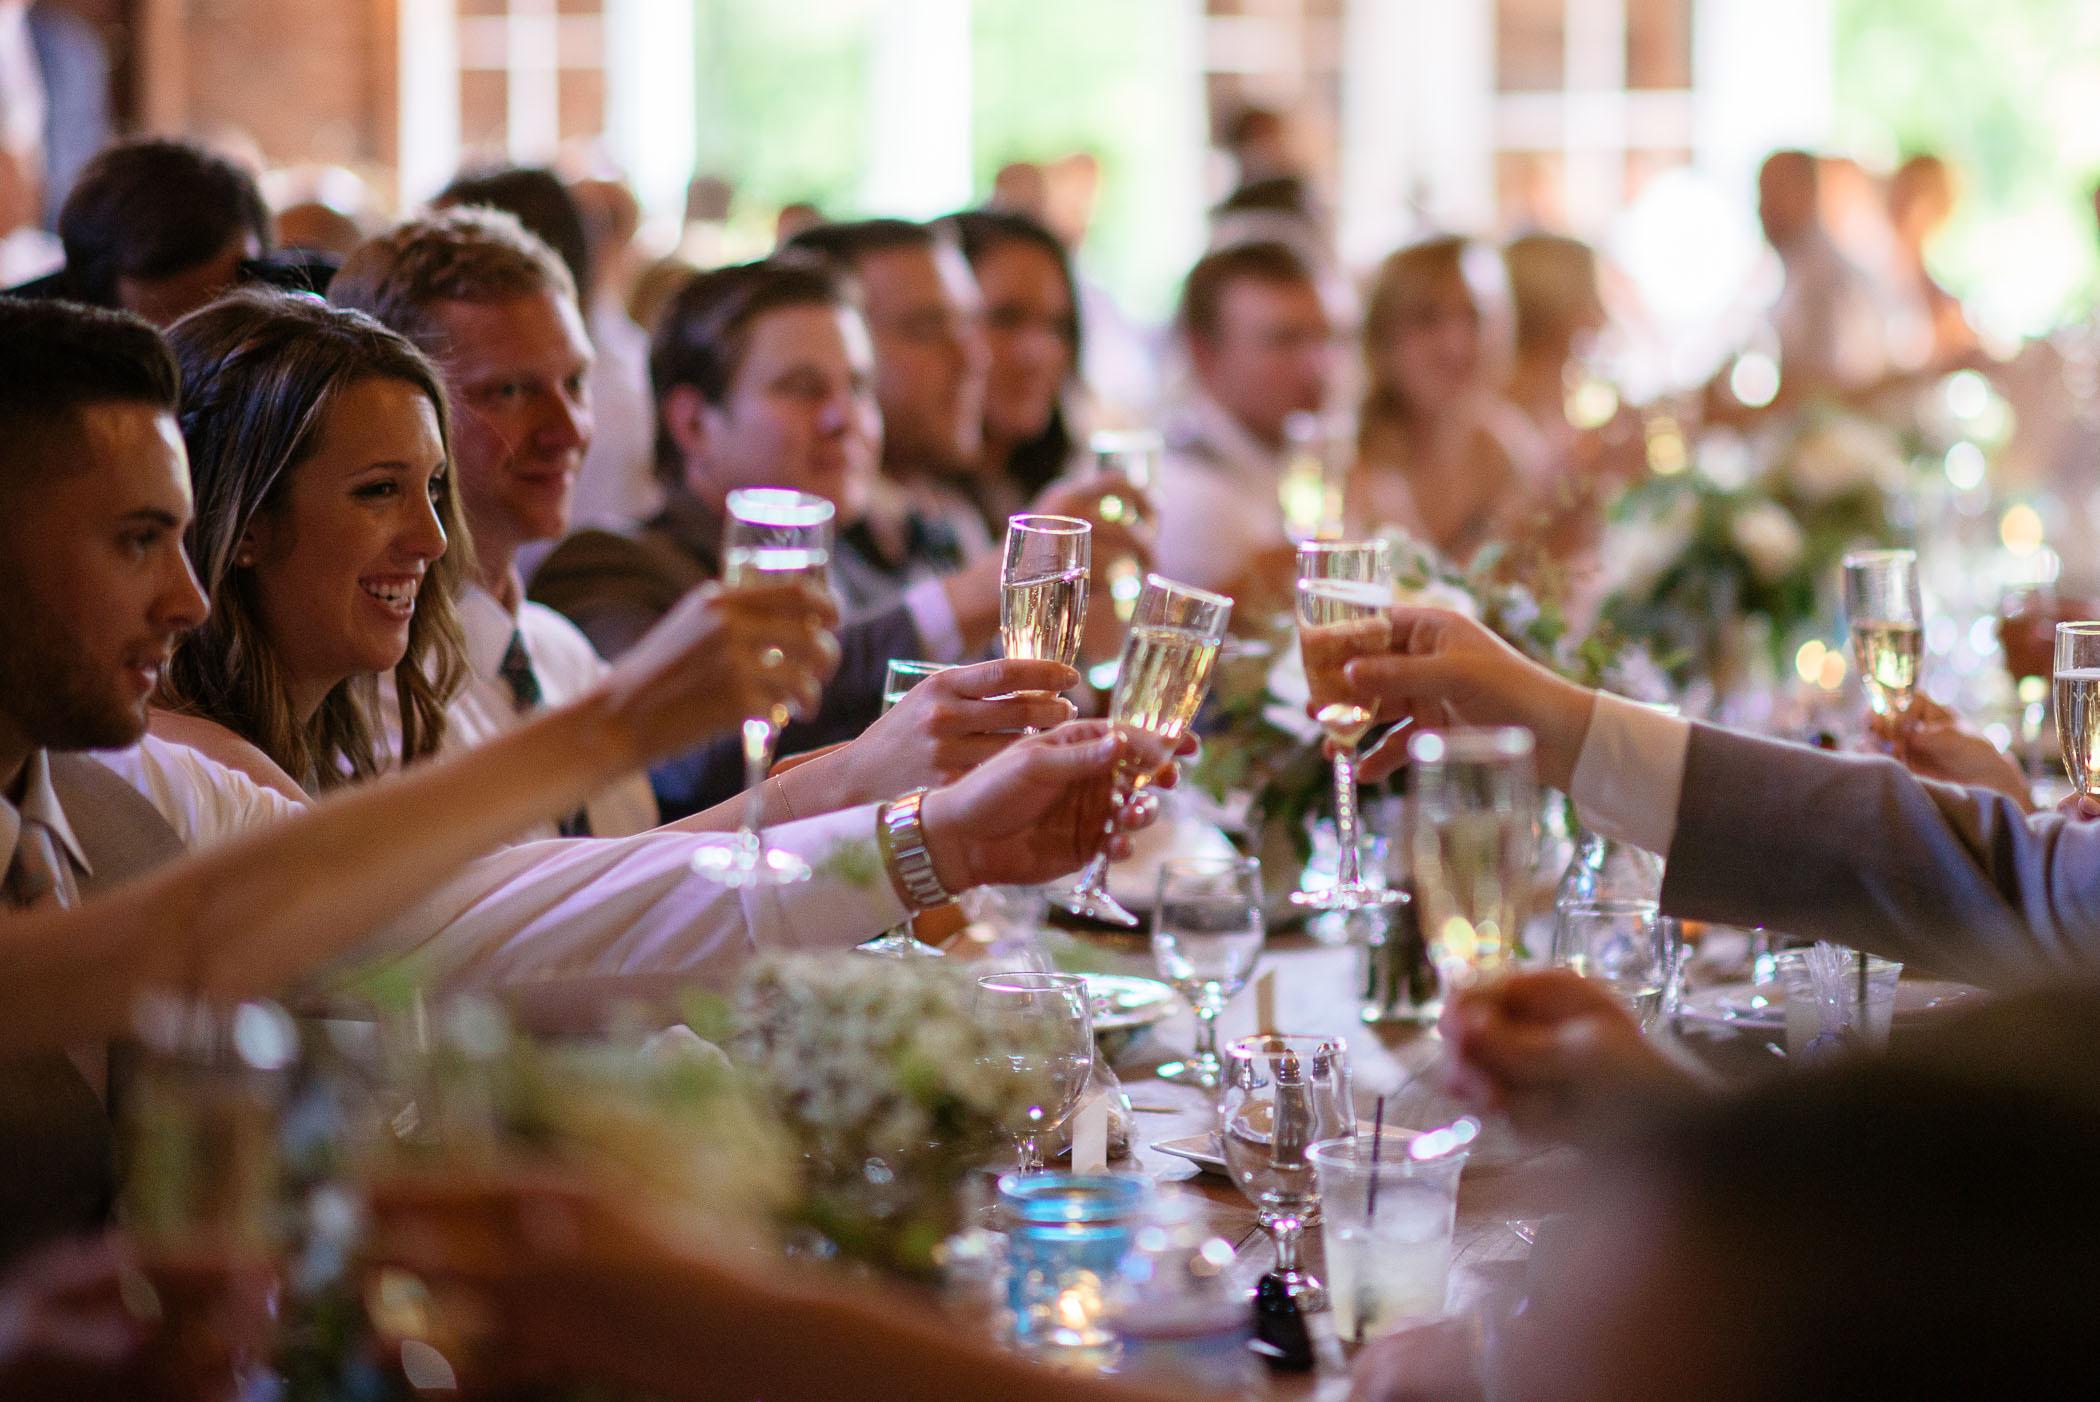 michigan_wedding_at_blue_dress_barn_037.jpg